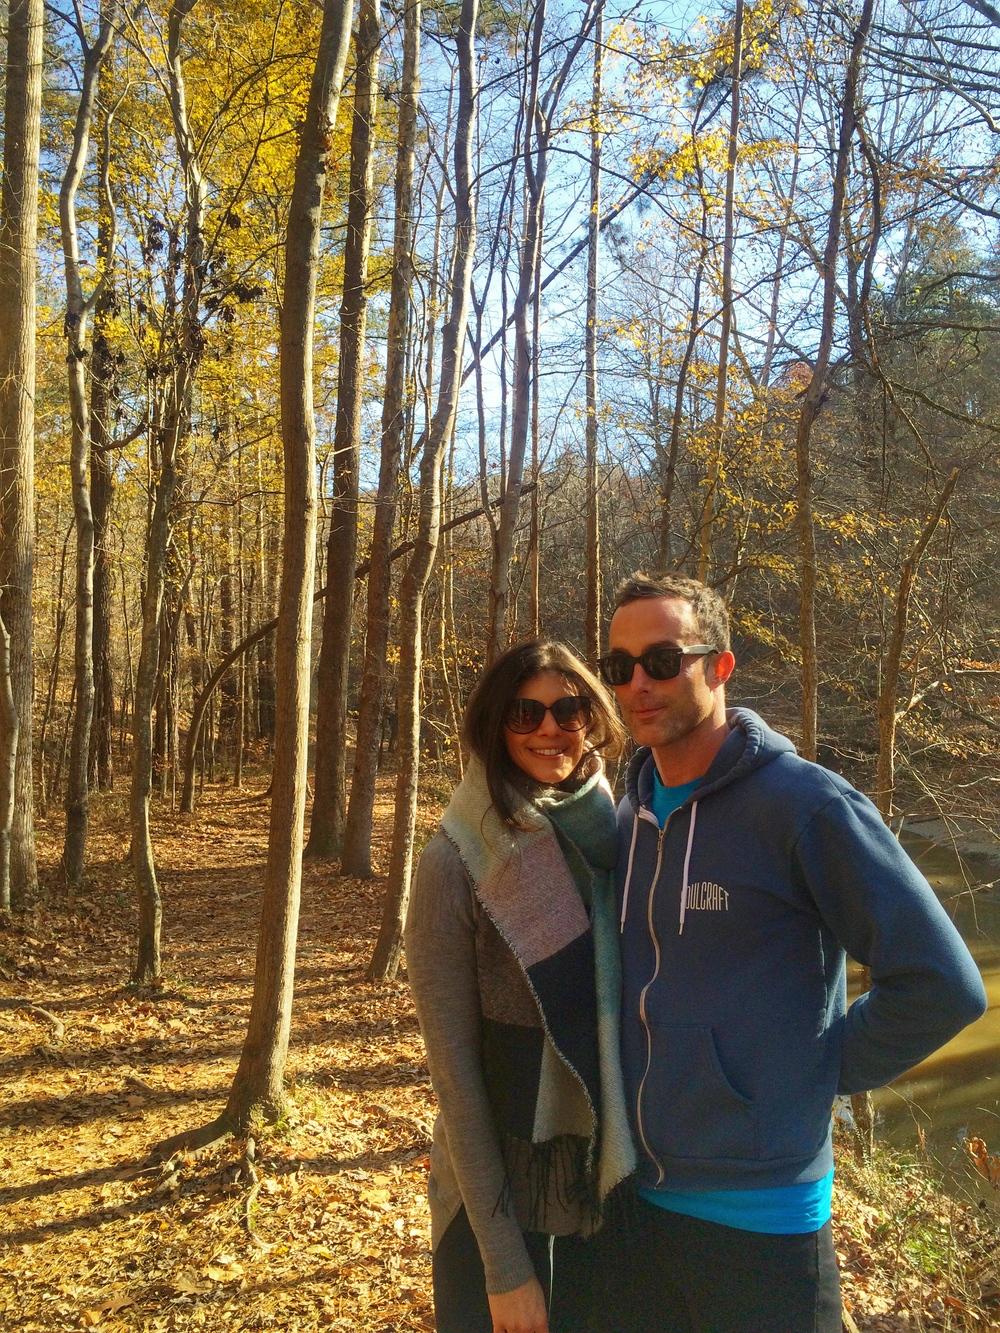 LaurenSchwaiger-Blog-Raleigh-UmsteadStatePark.jpg